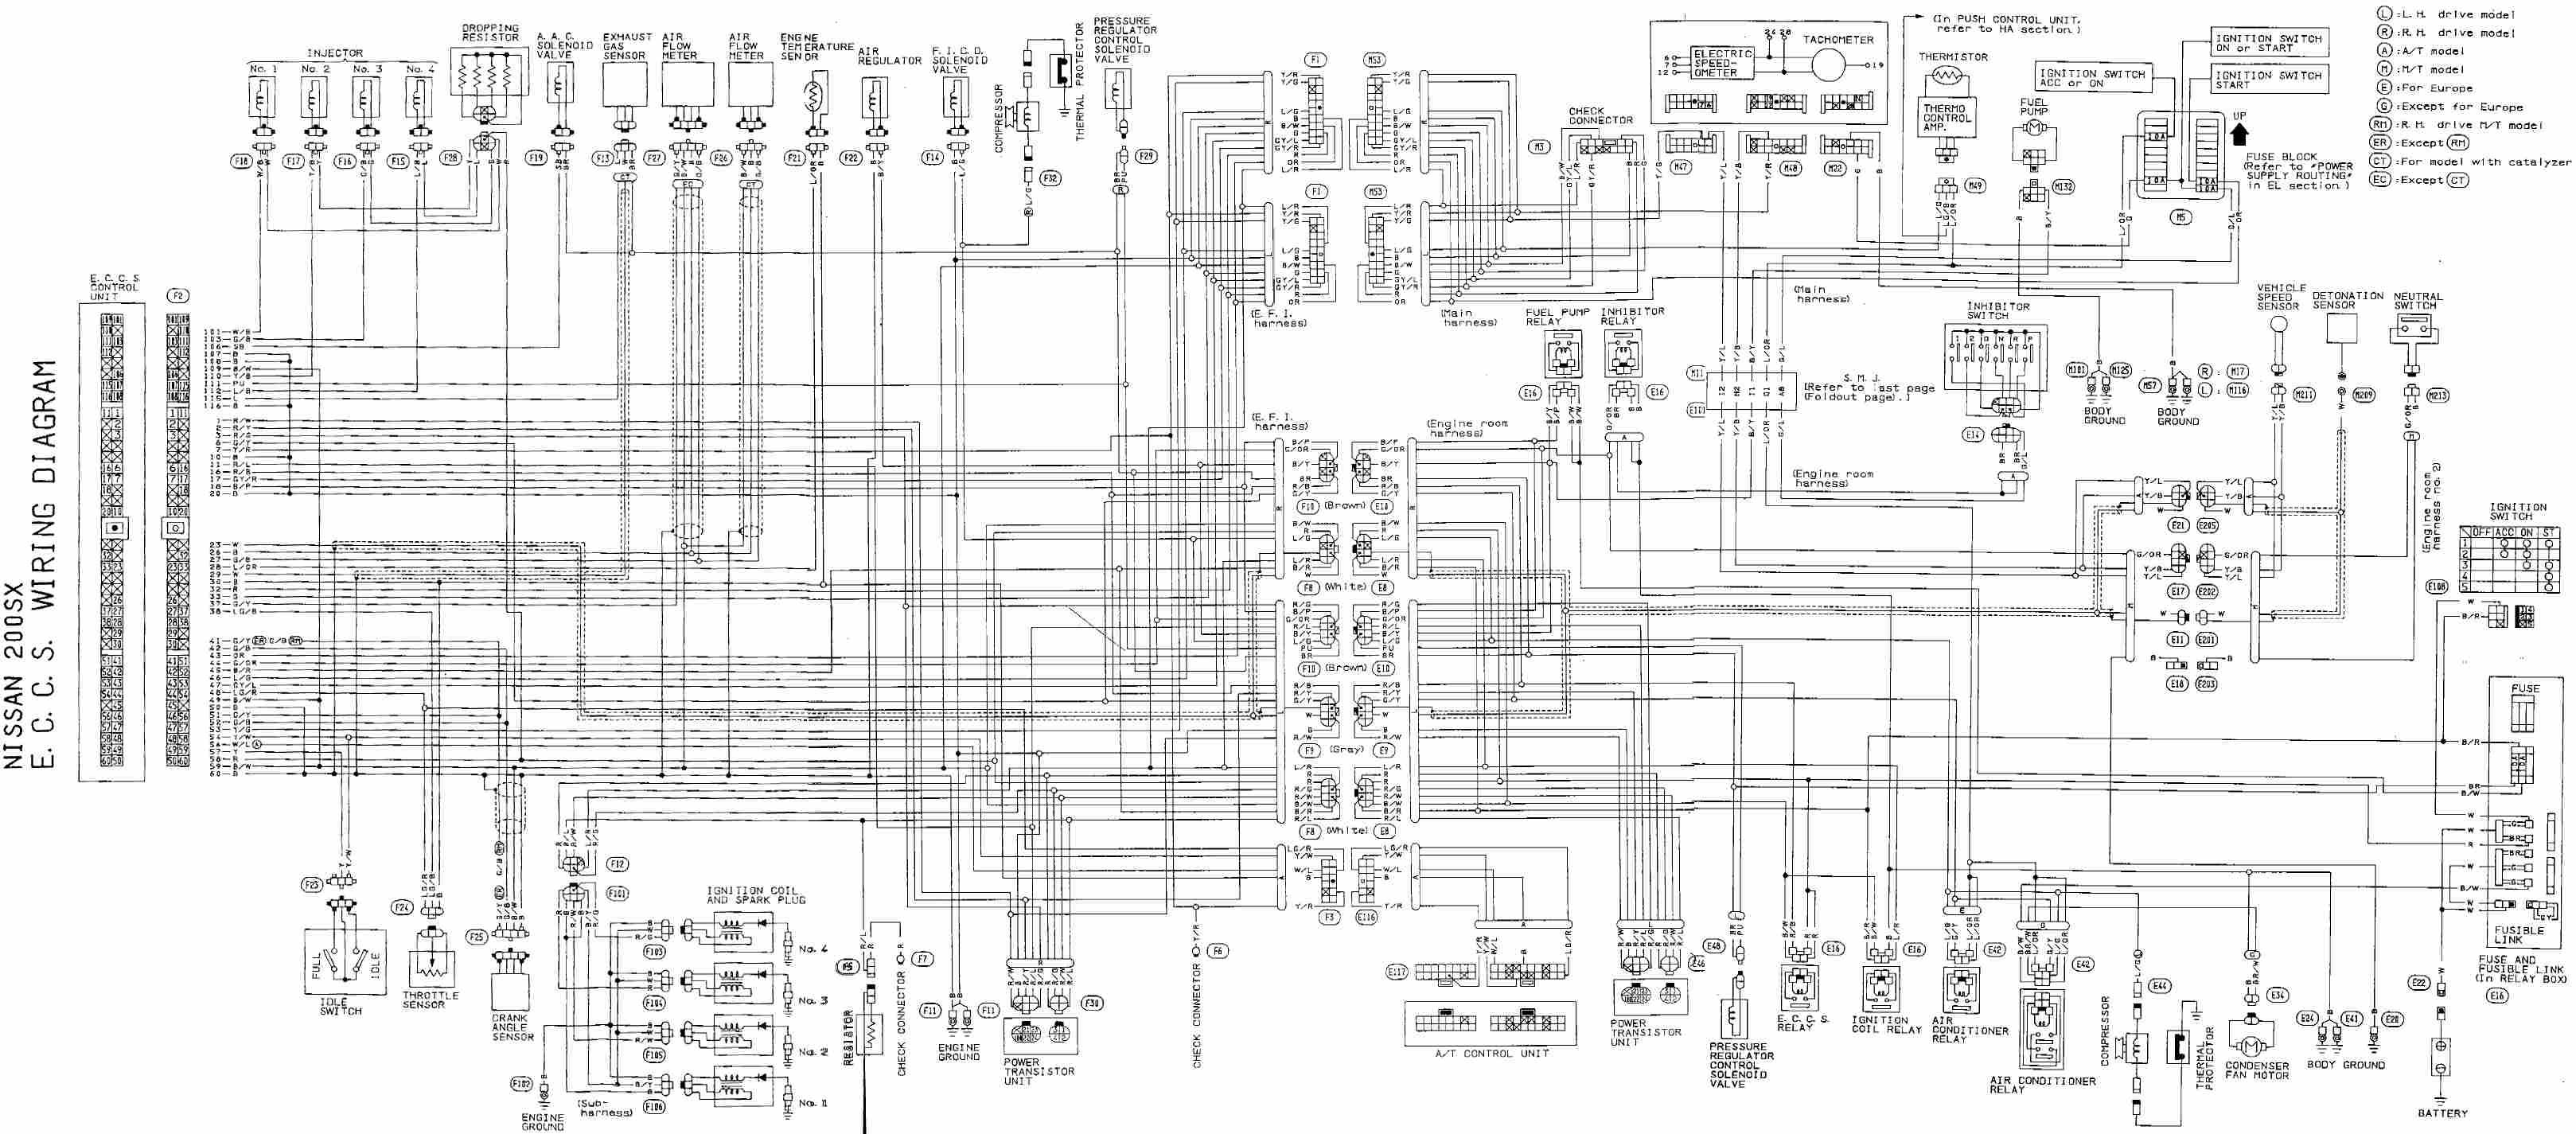 1986 ford ranger wiring diagram